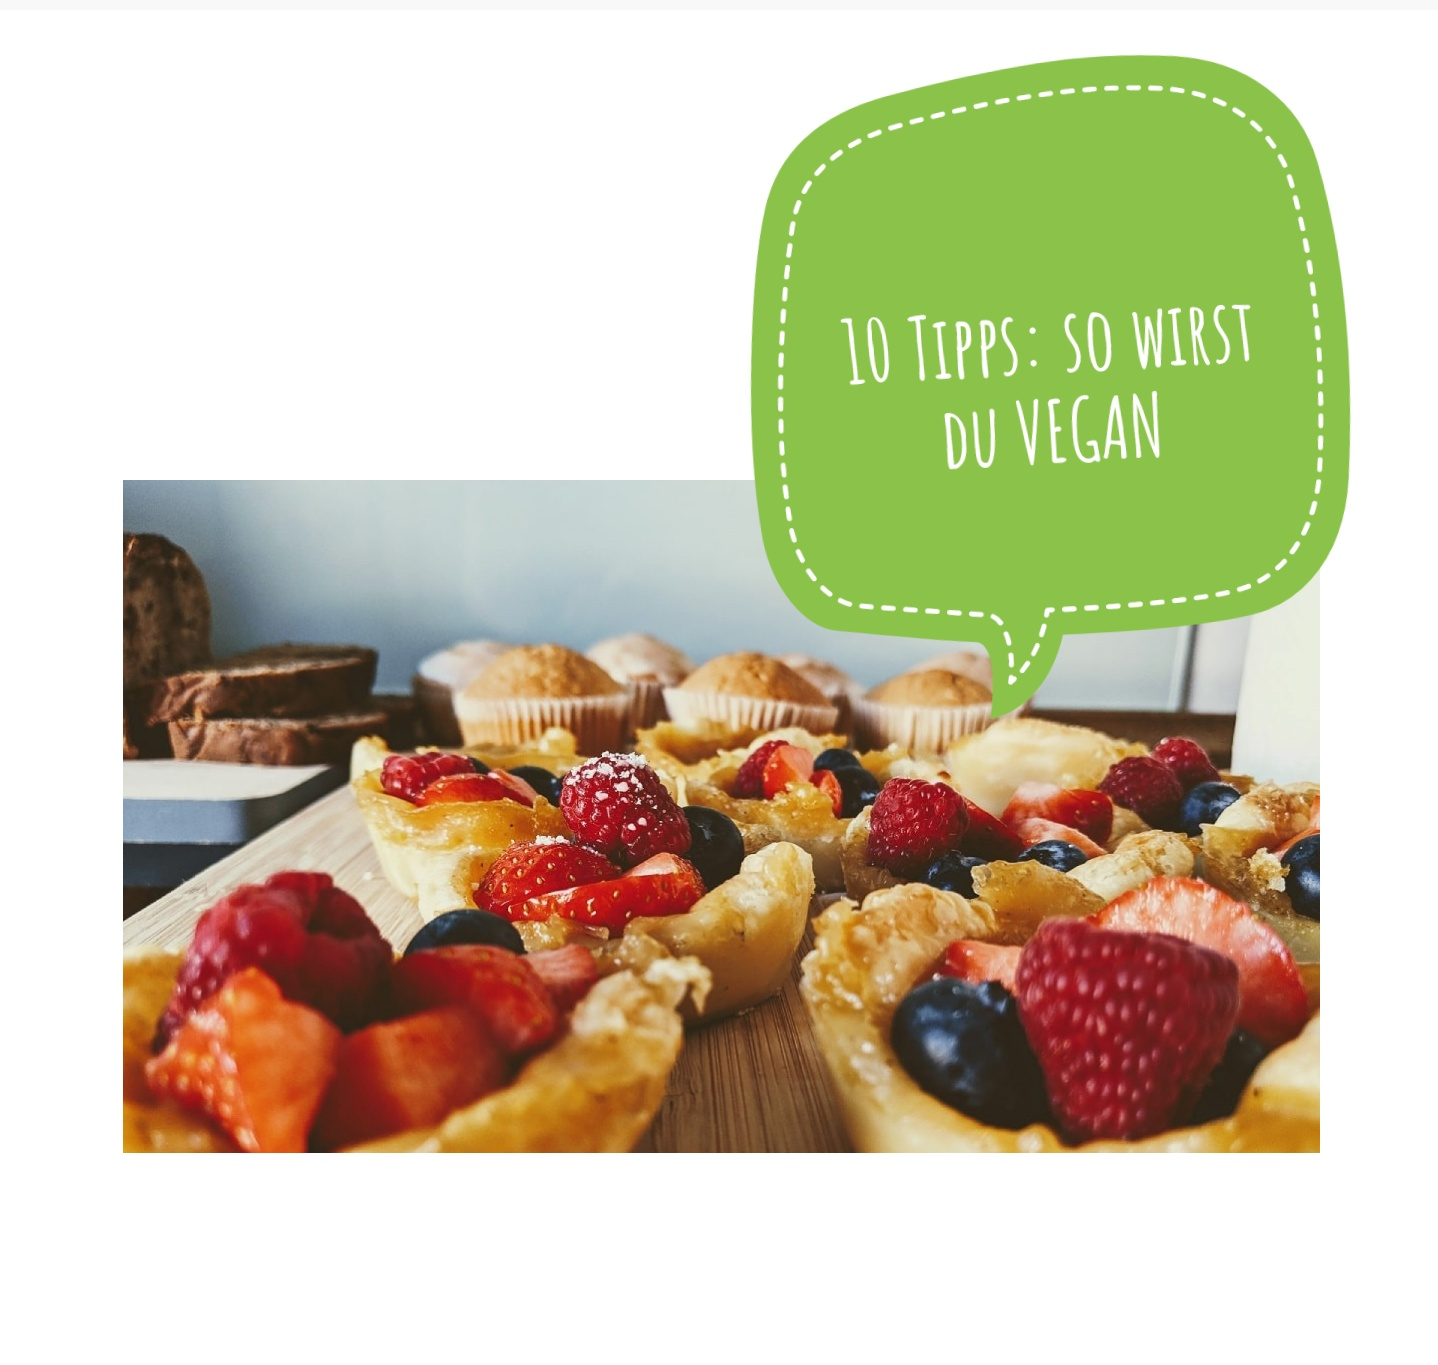 10 Tipps - So wirst du Vegan - Veganuar 2020